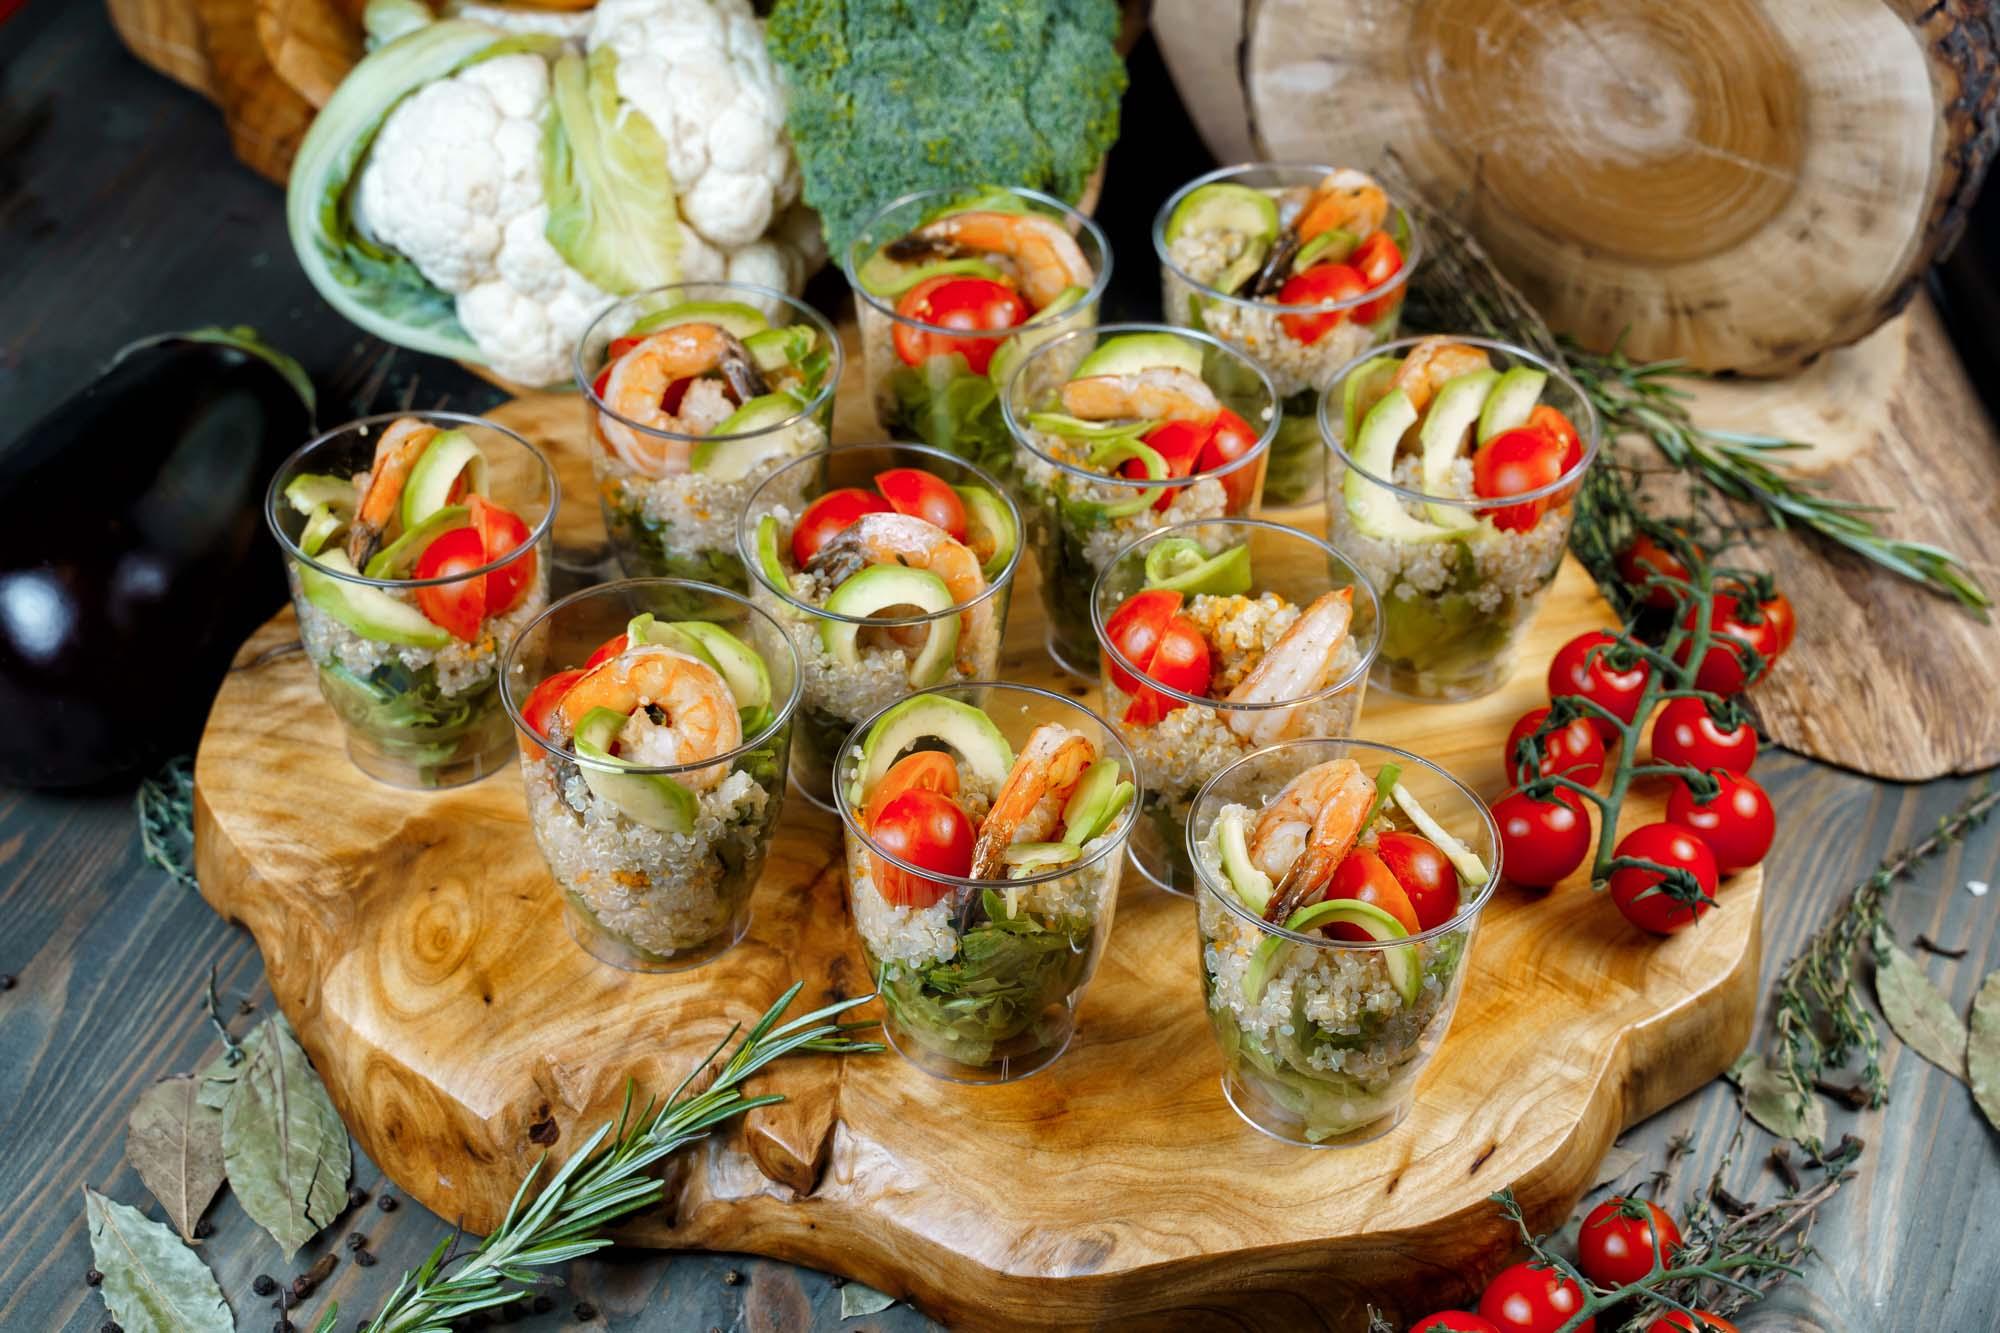 СЕТ №52 Калифорнийский салат с креветками, киноа и авокадо 12 шт по 60 гр